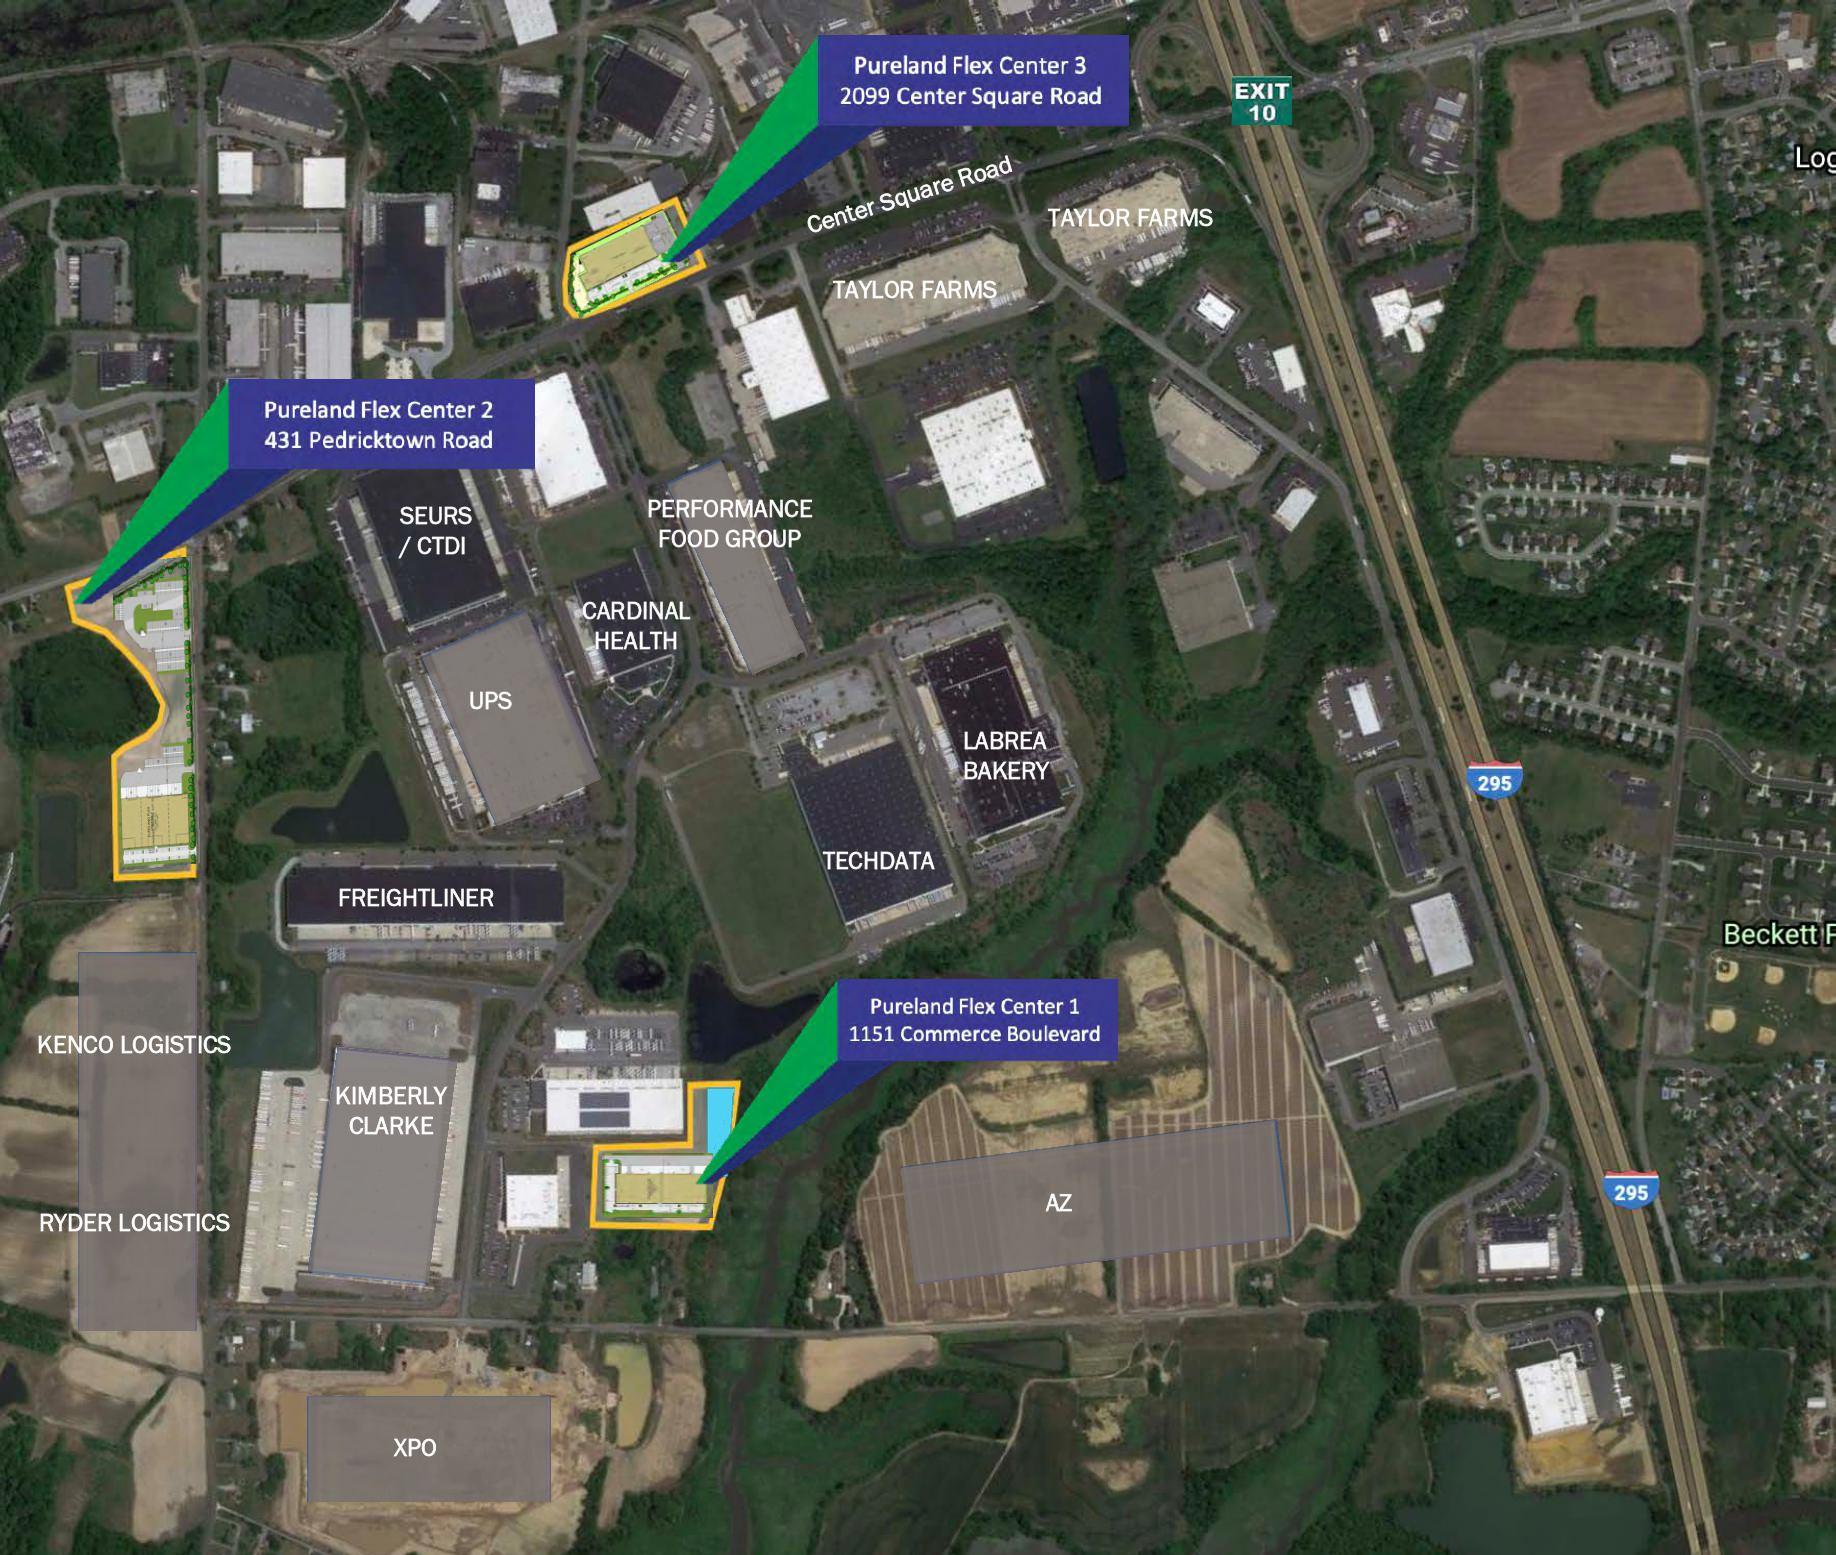 Pureland Flex Center - Overview Map